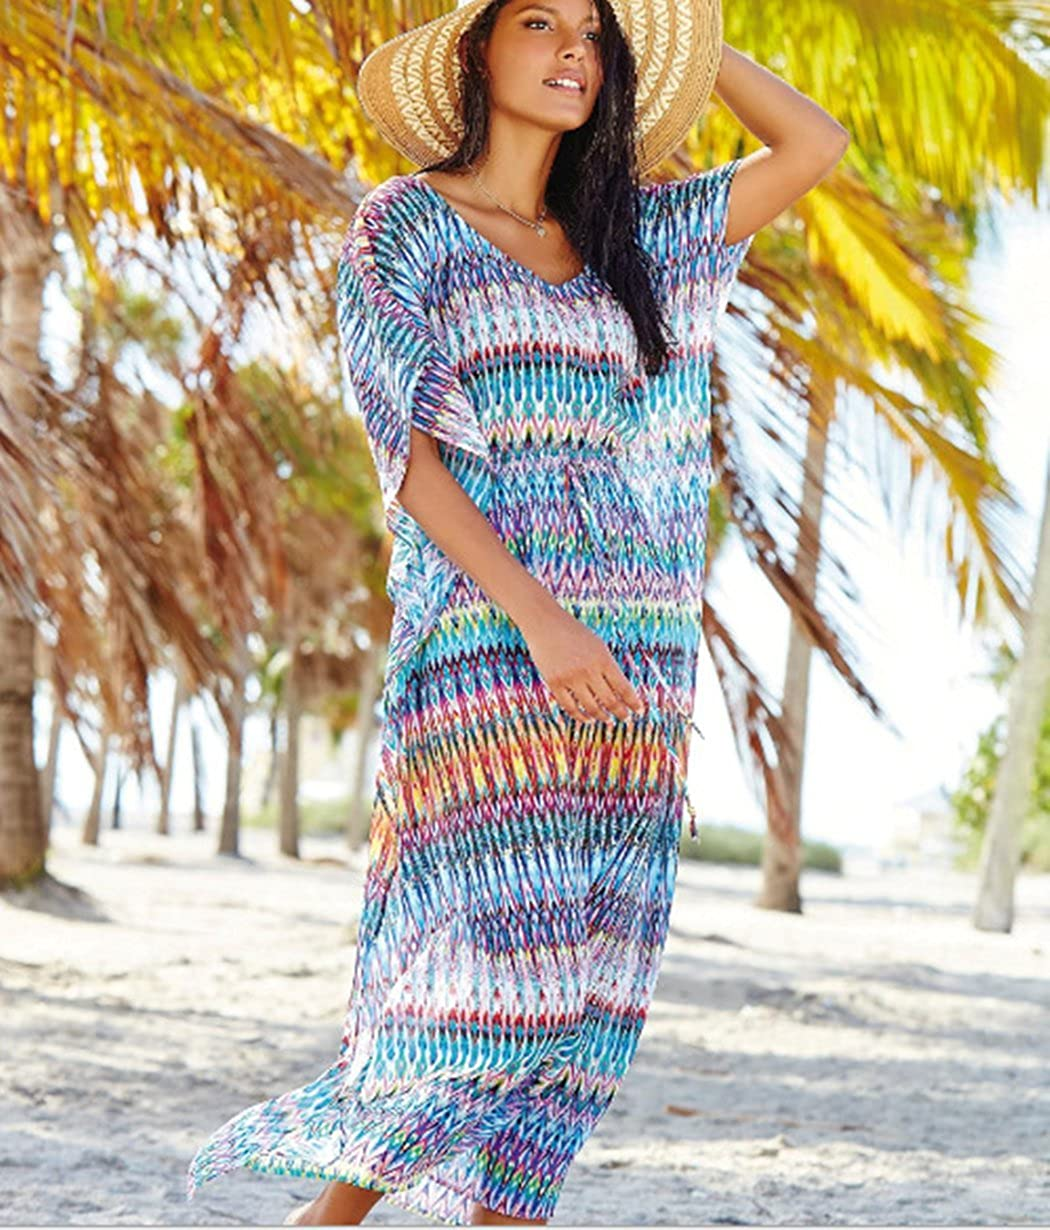 Strandtuch Chiffon Badekleidung Kleid lang Esenfa Kaftan f/ür Damen